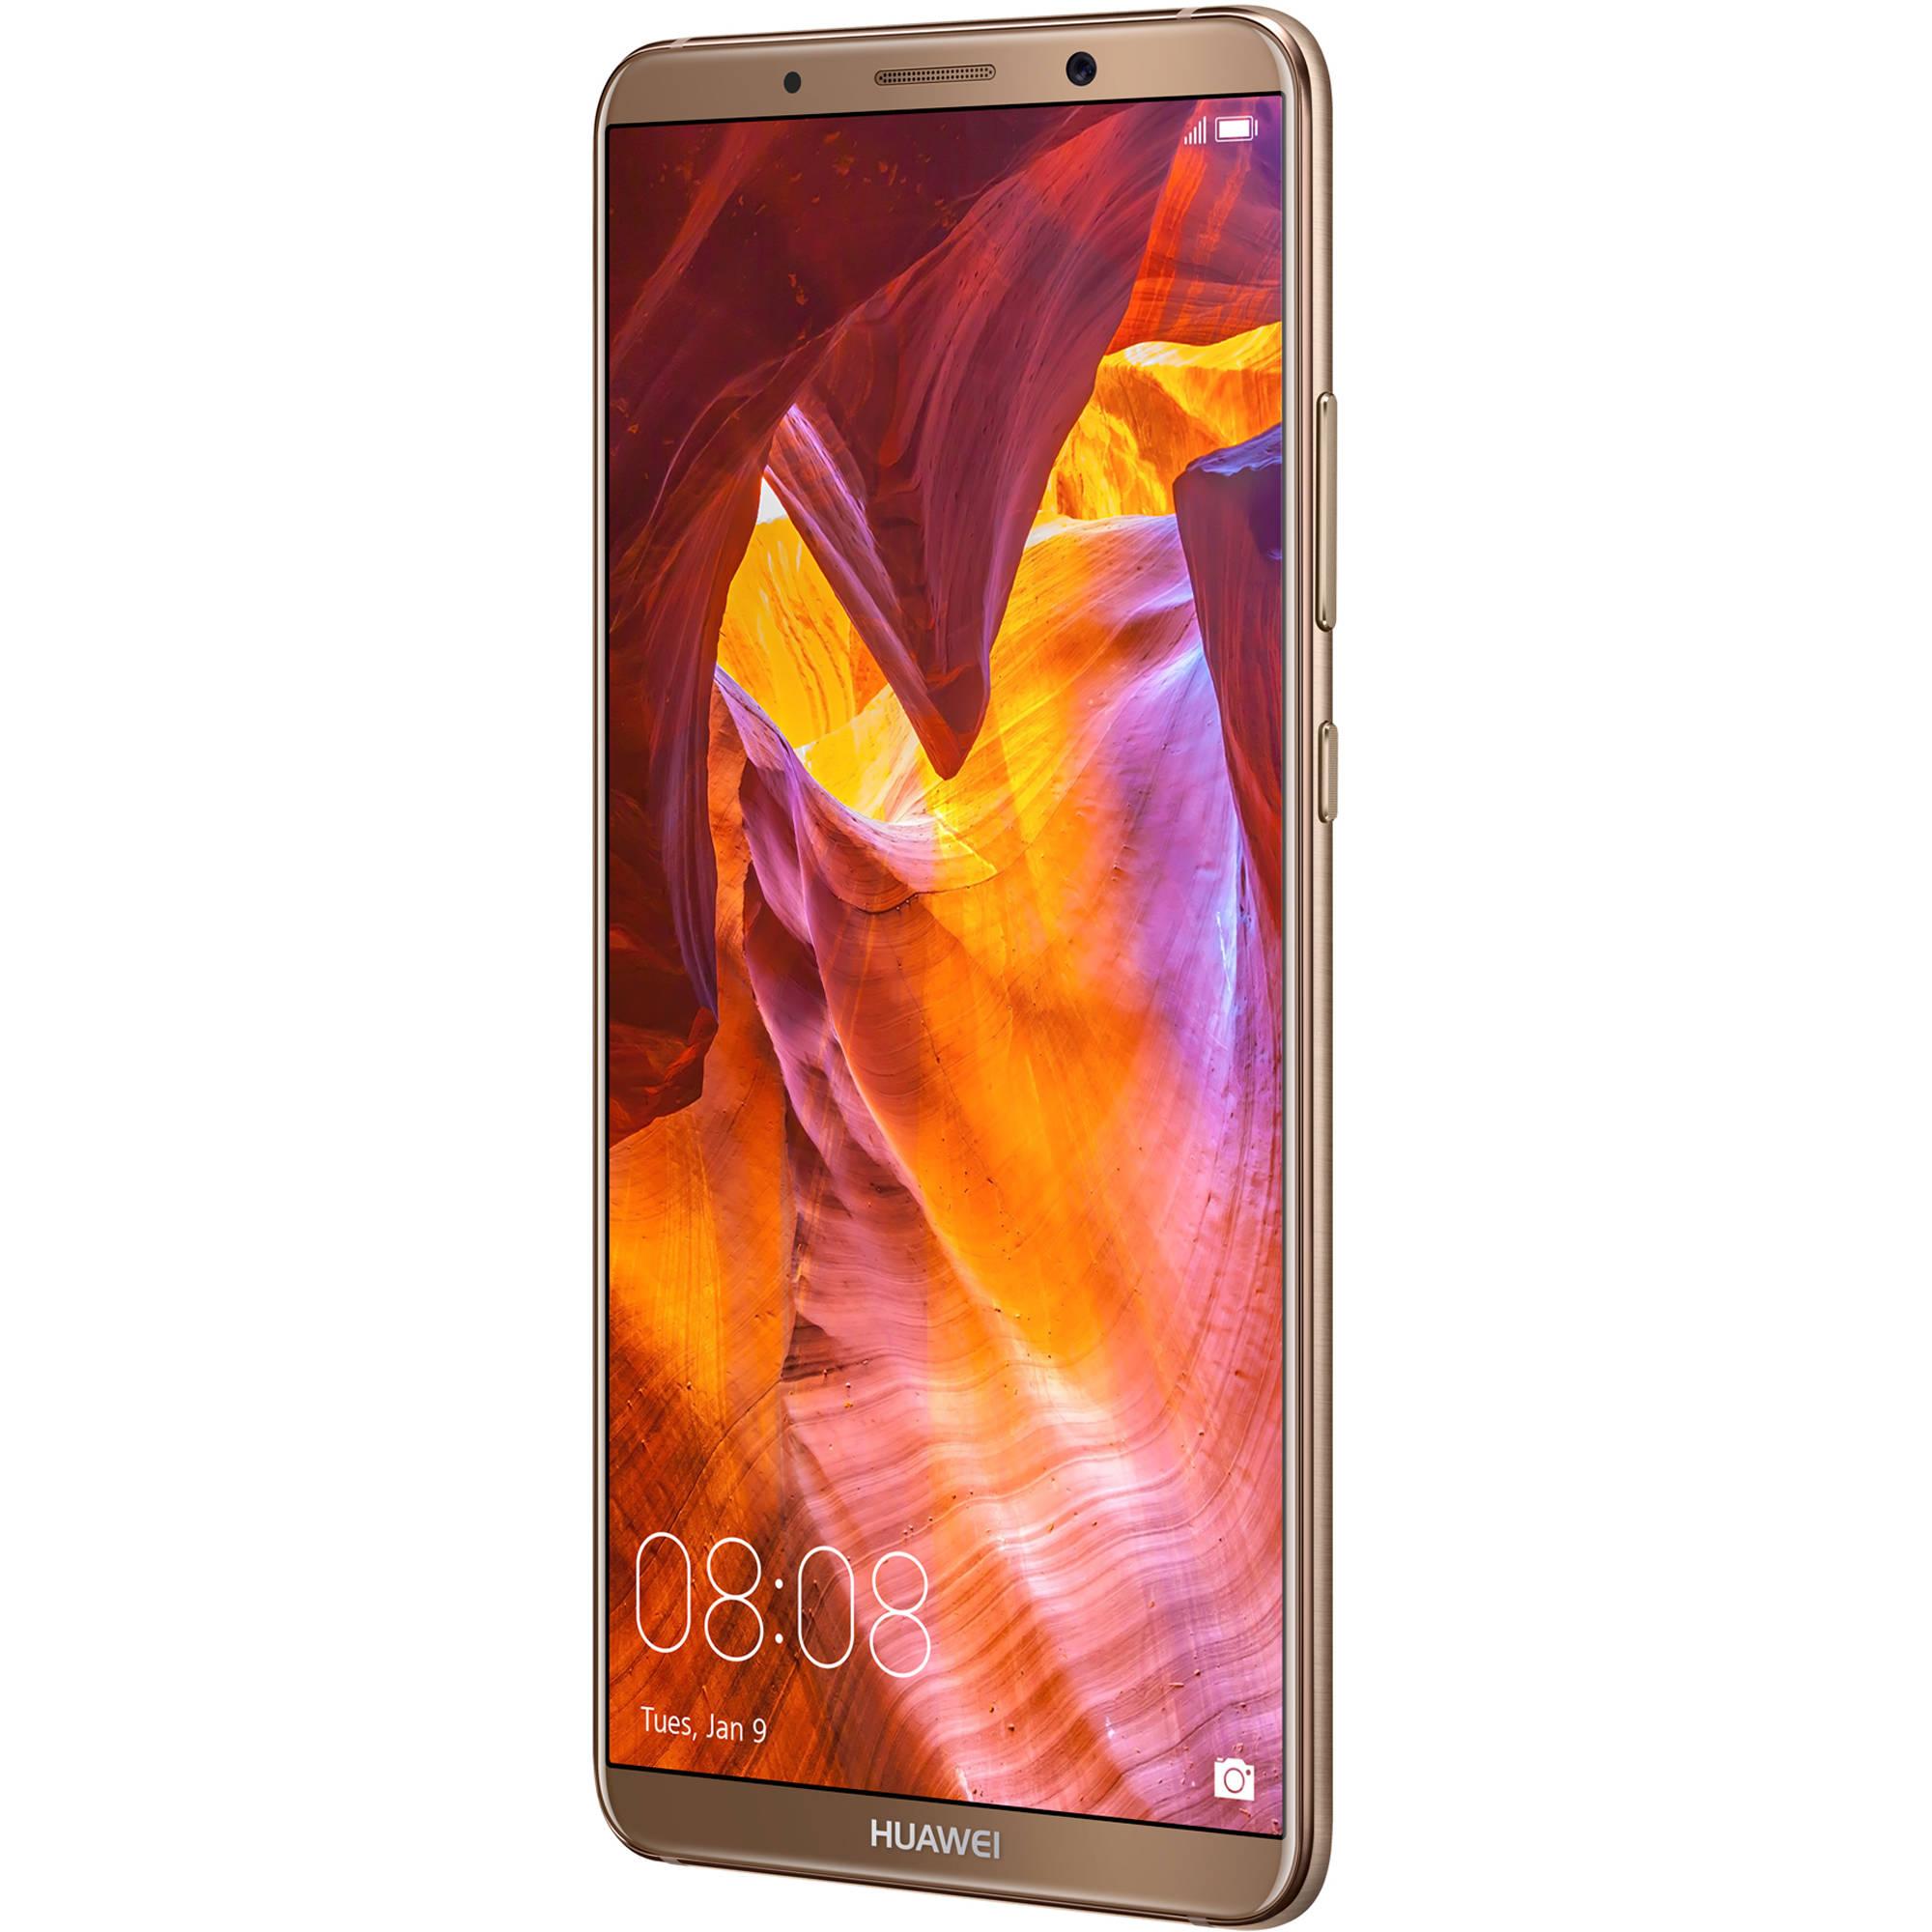 Huawei Mate 10 Pro BLA-A09 128GB Smartphone (Unlocked, Mocha)